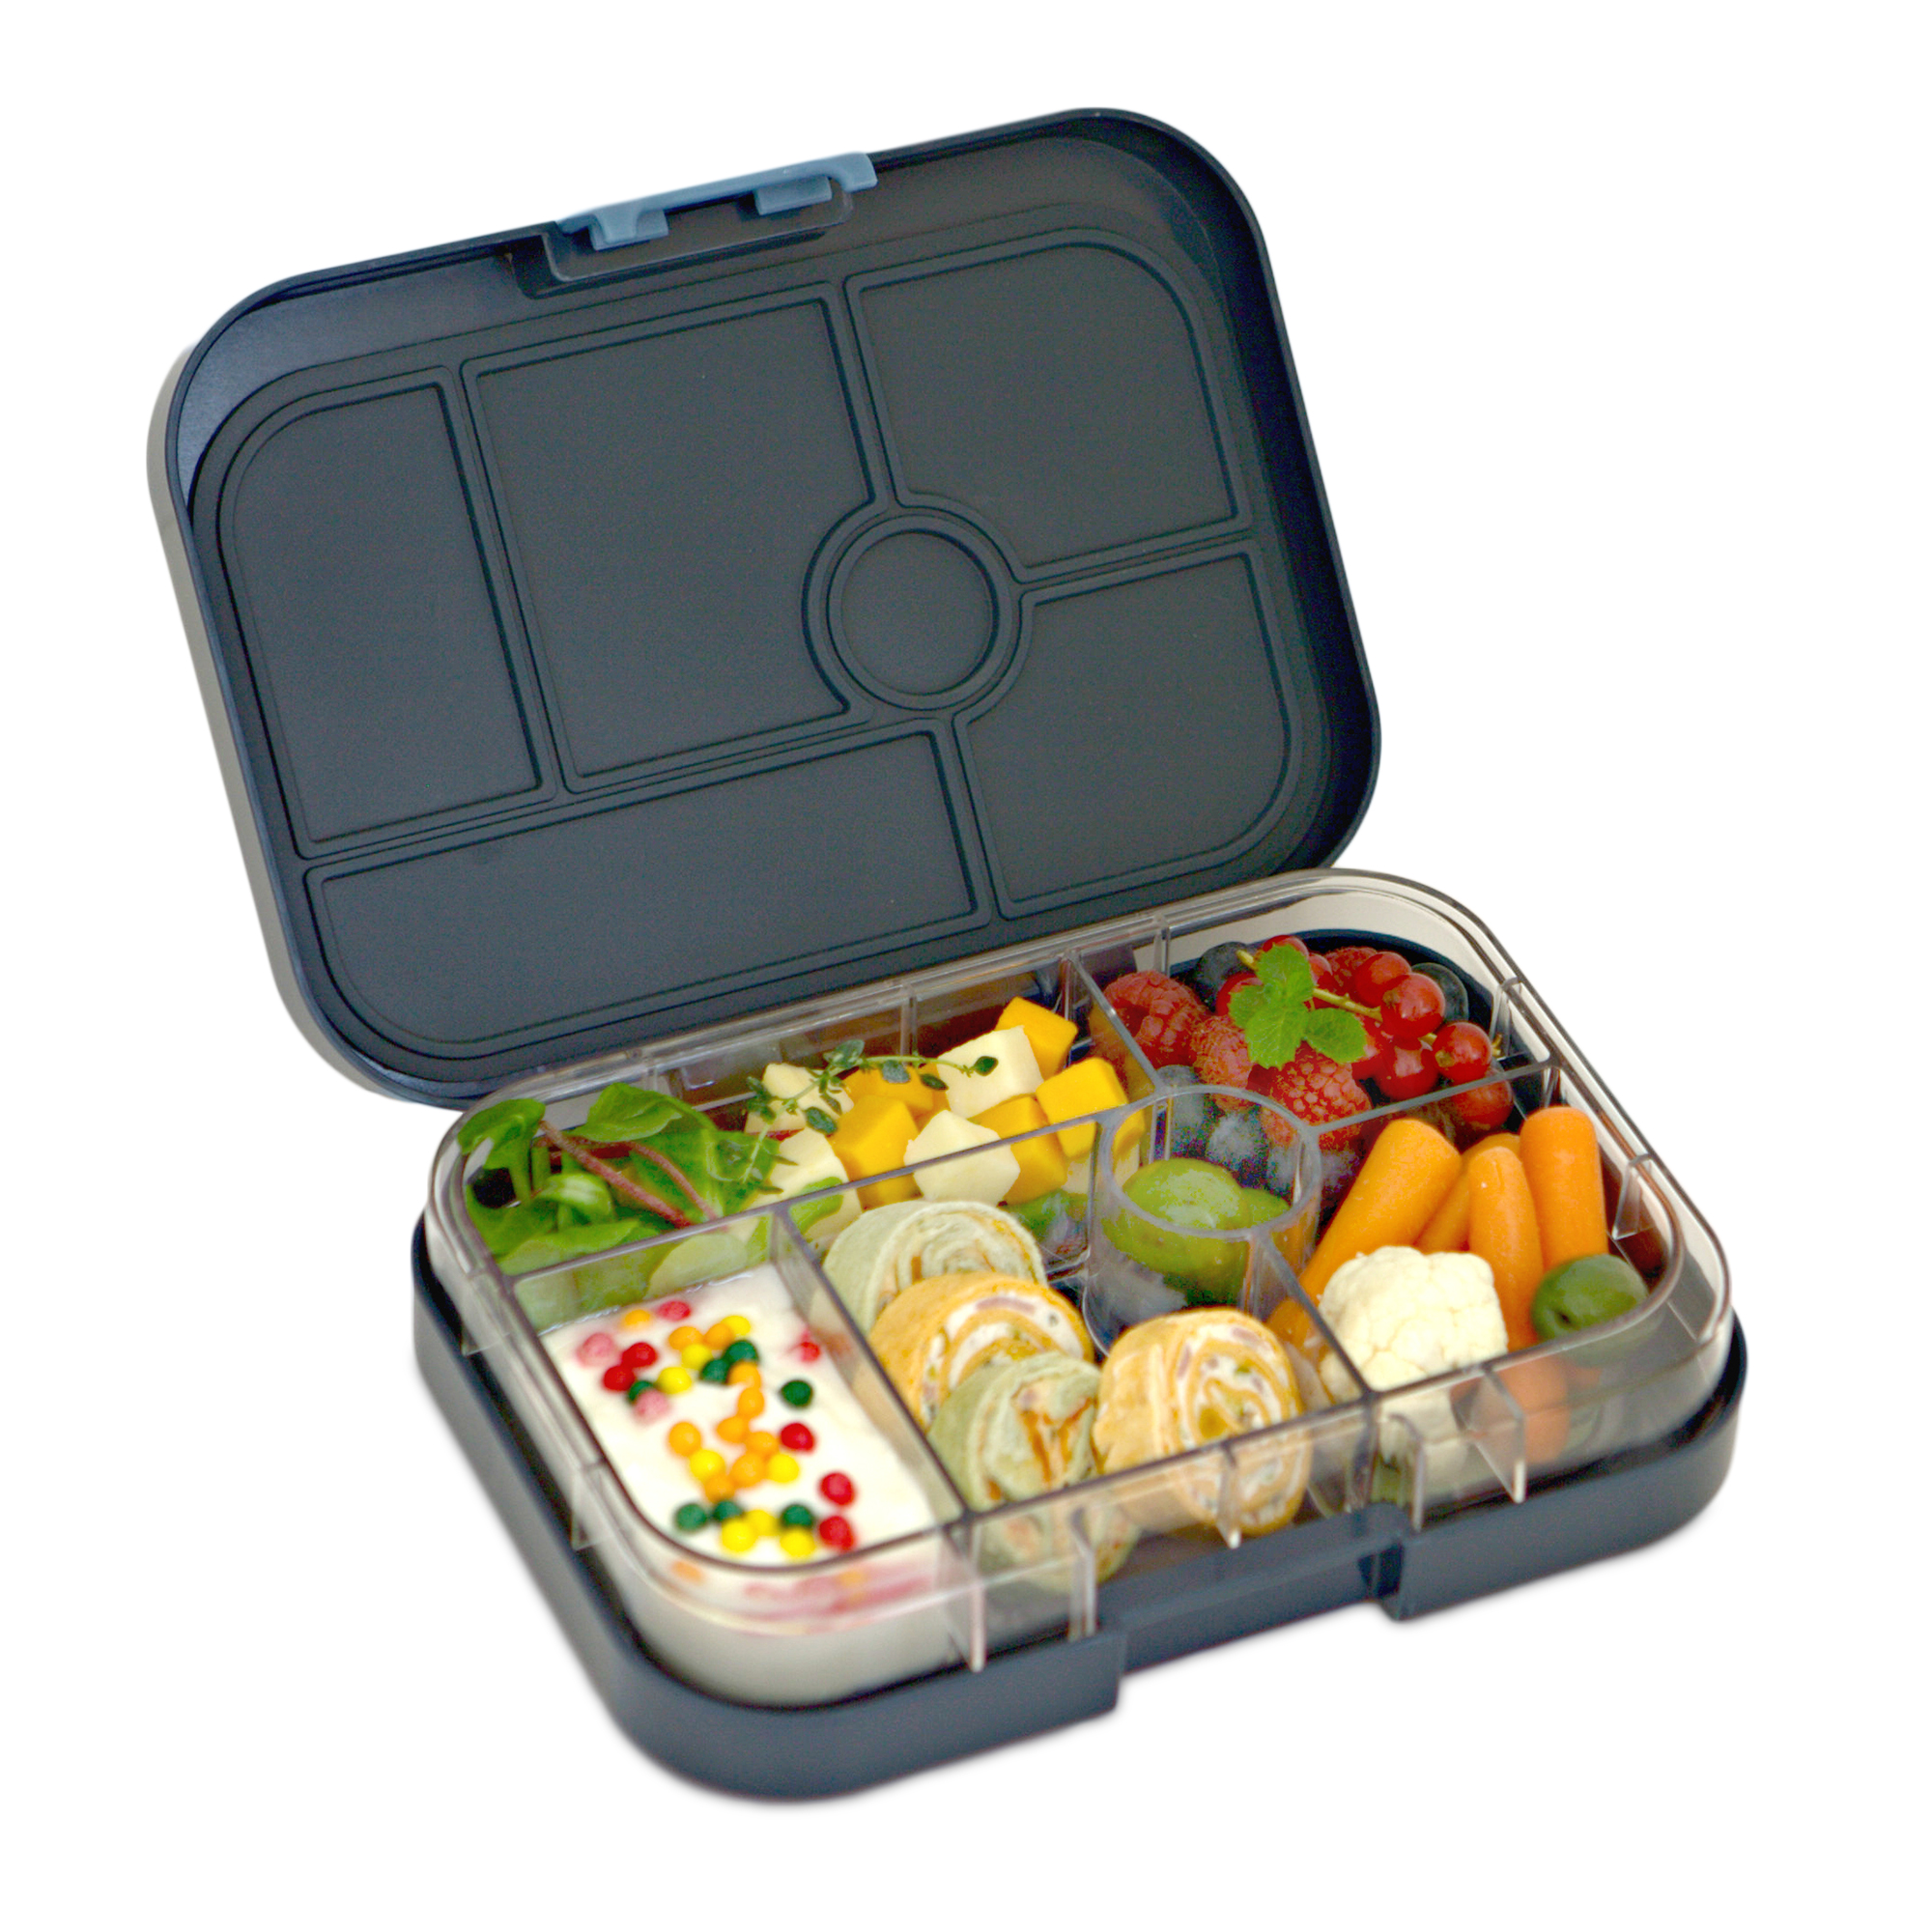 yumbox original lunch box espace blue. Black Bedroom Furniture Sets. Home Design Ideas